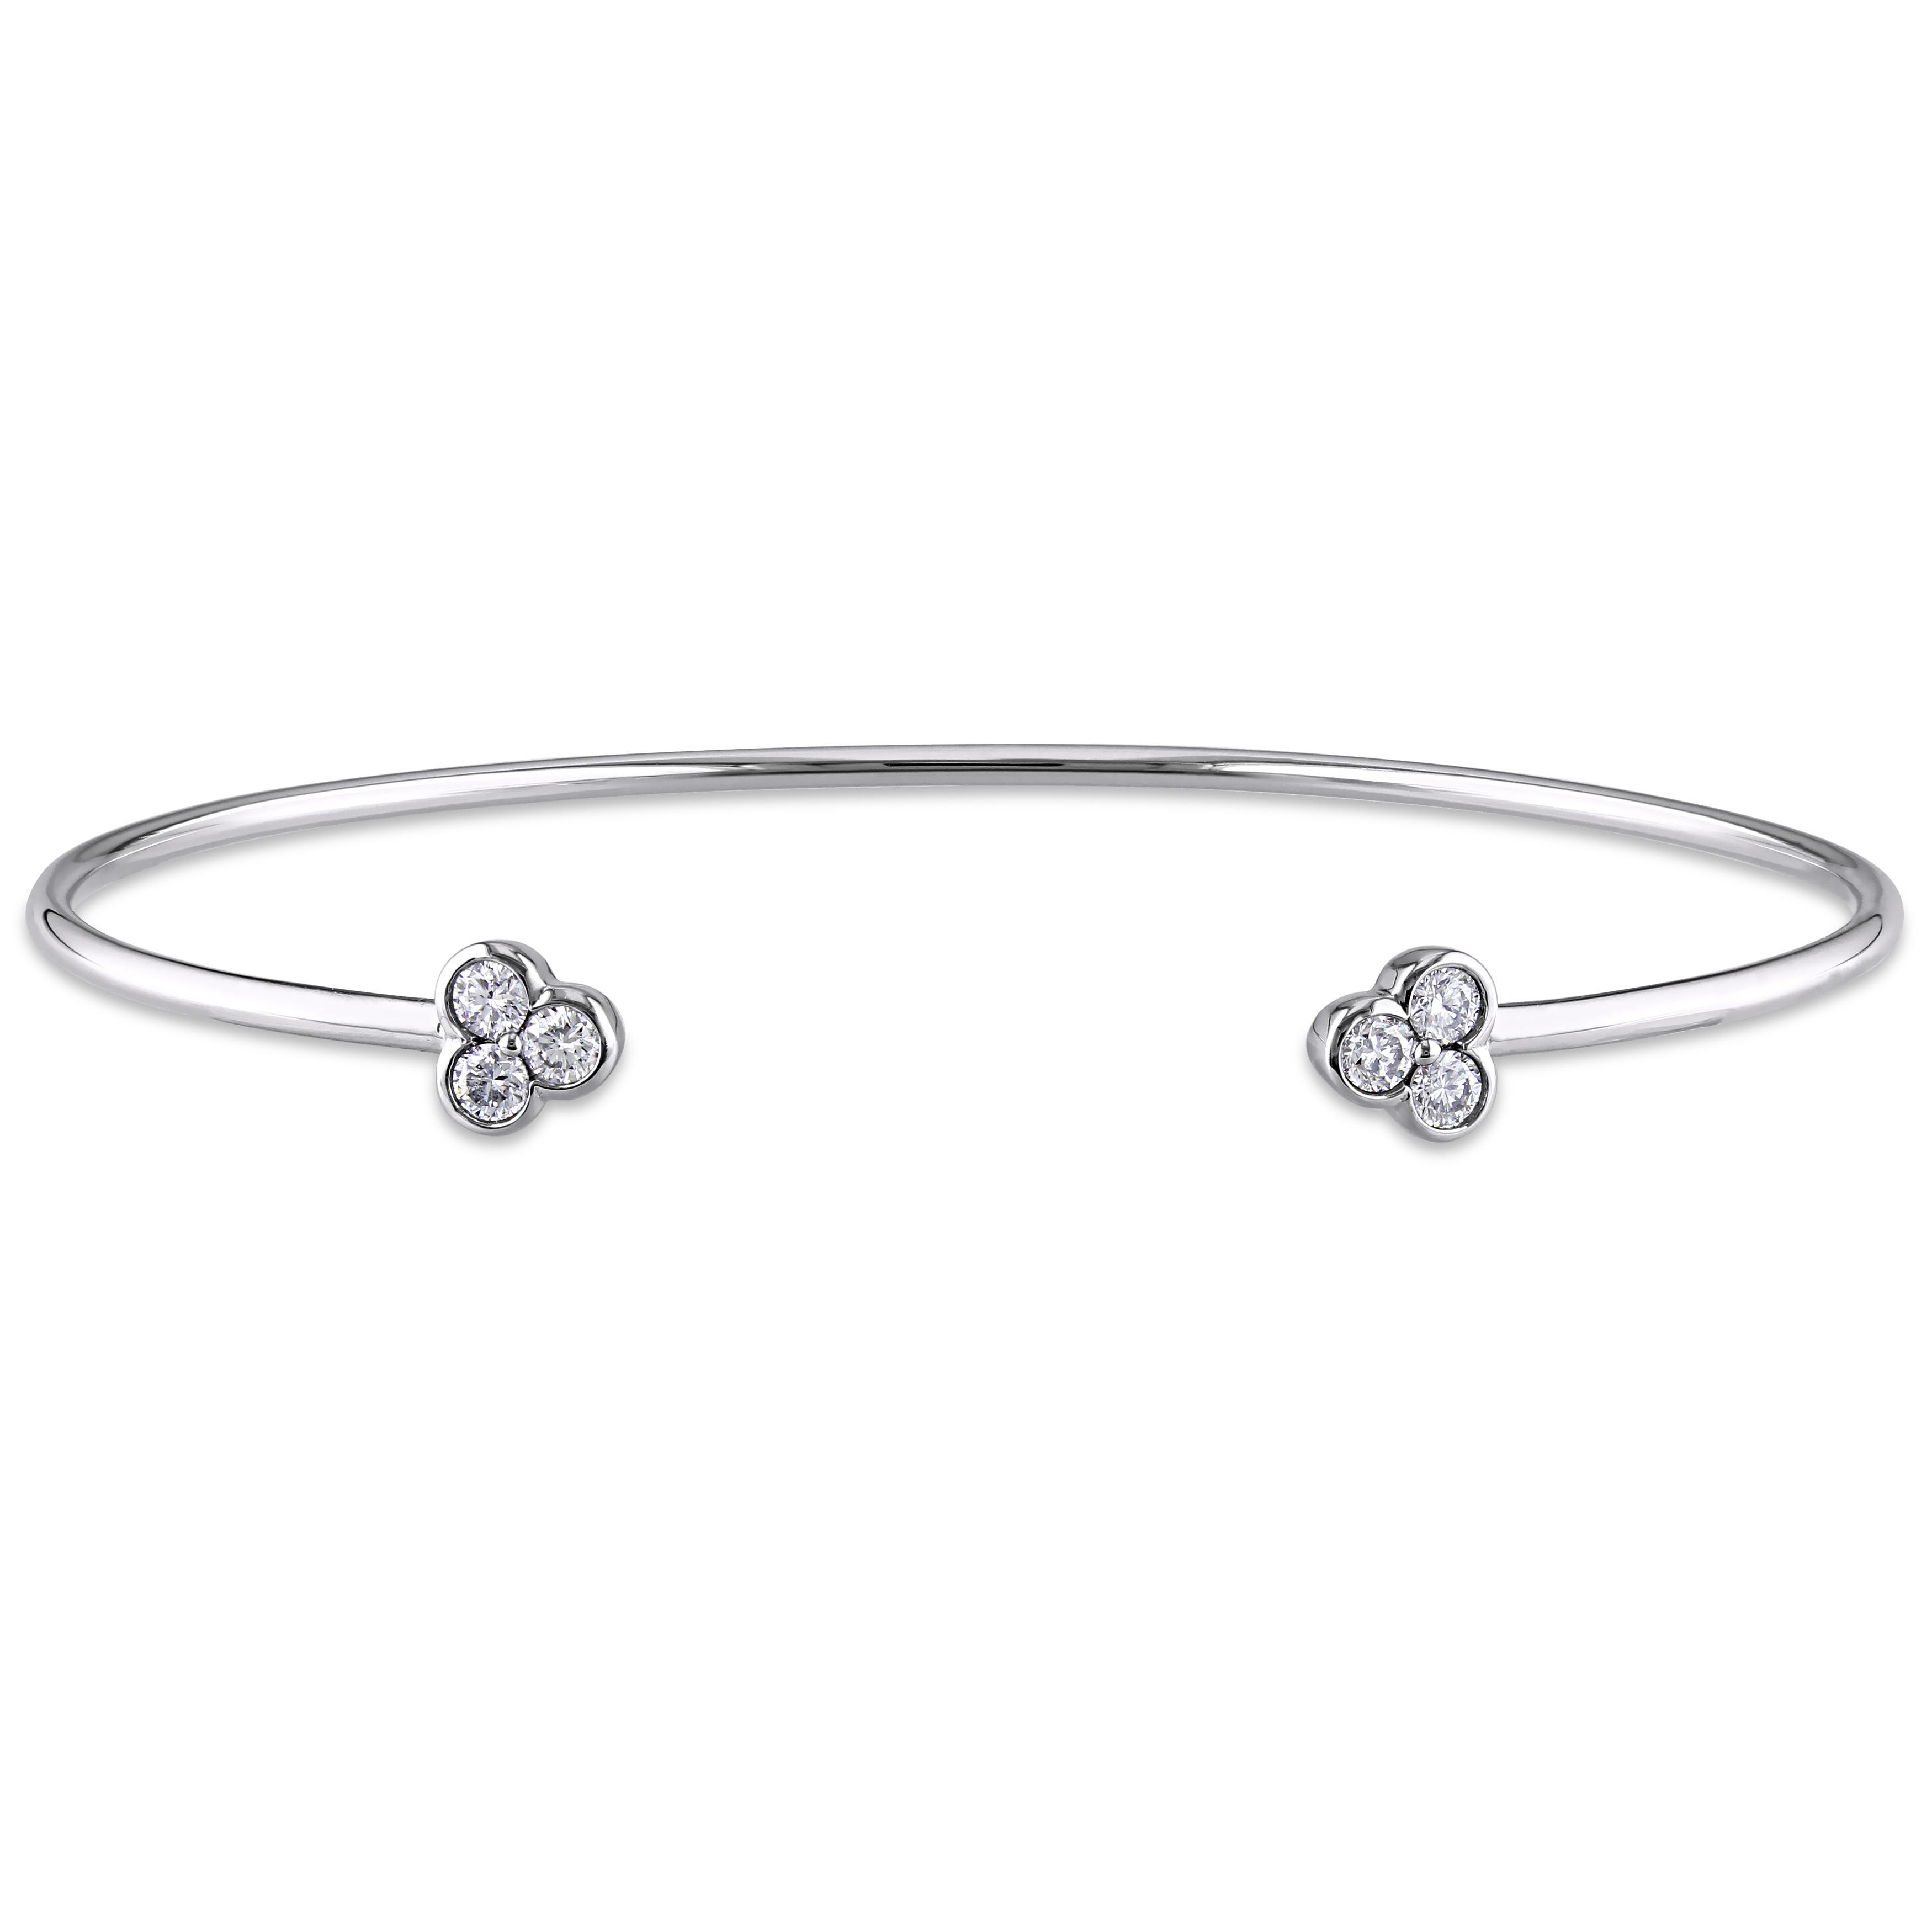 White Gold Cuff Bracelet: Diamond Three Stone Open Cuff Bangle Bracelet 14k White